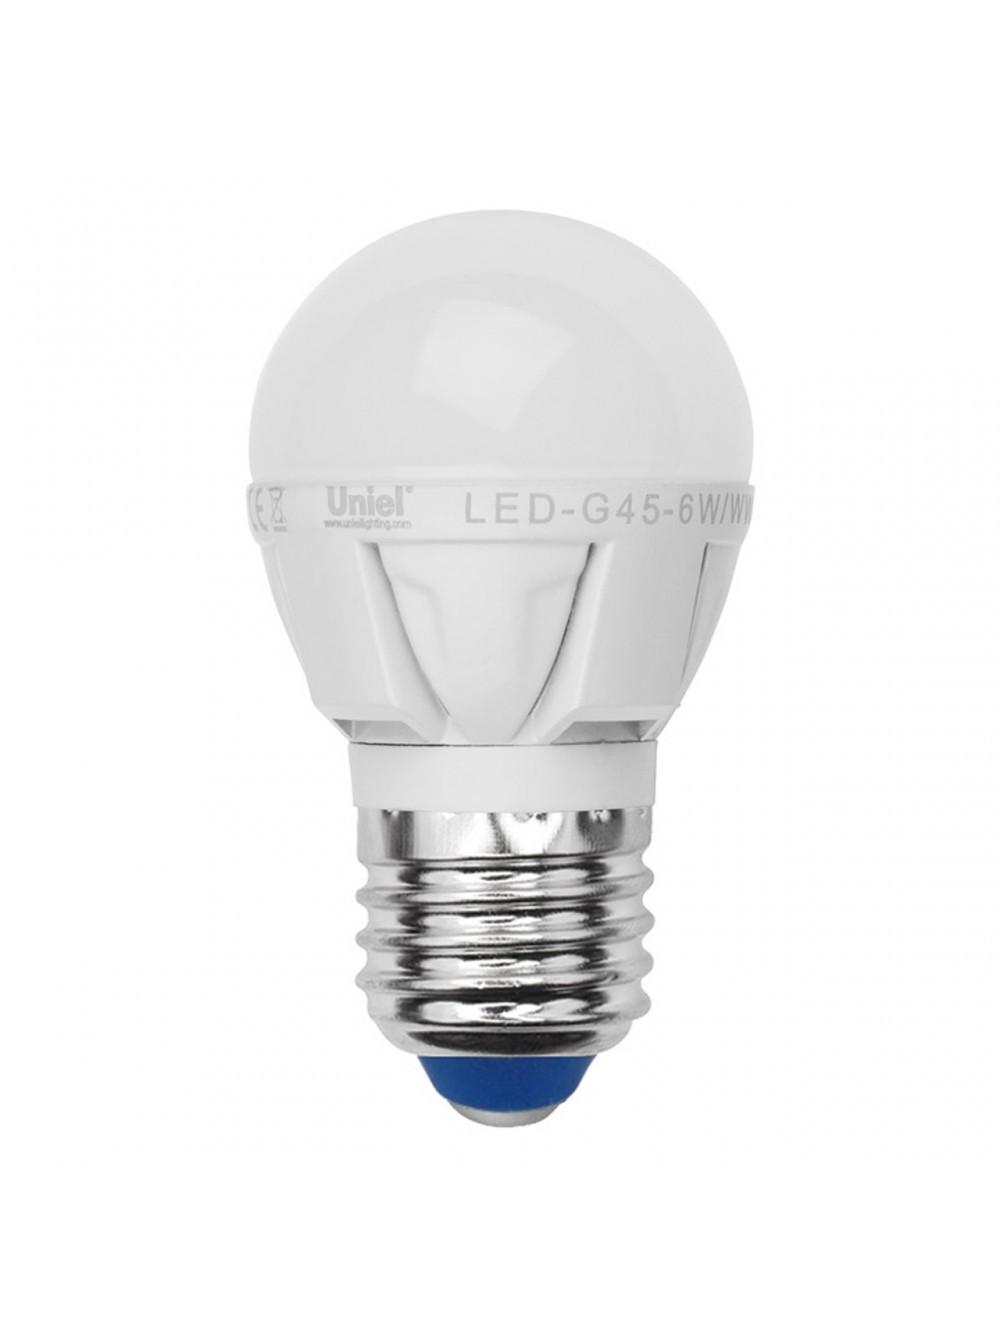 Лампа светодиодная Uniel Led-g45-7w/nw/e27/fr plp01wh лампа светодиодная uniel led cw37 6w nw e14 fr dim plp01wh